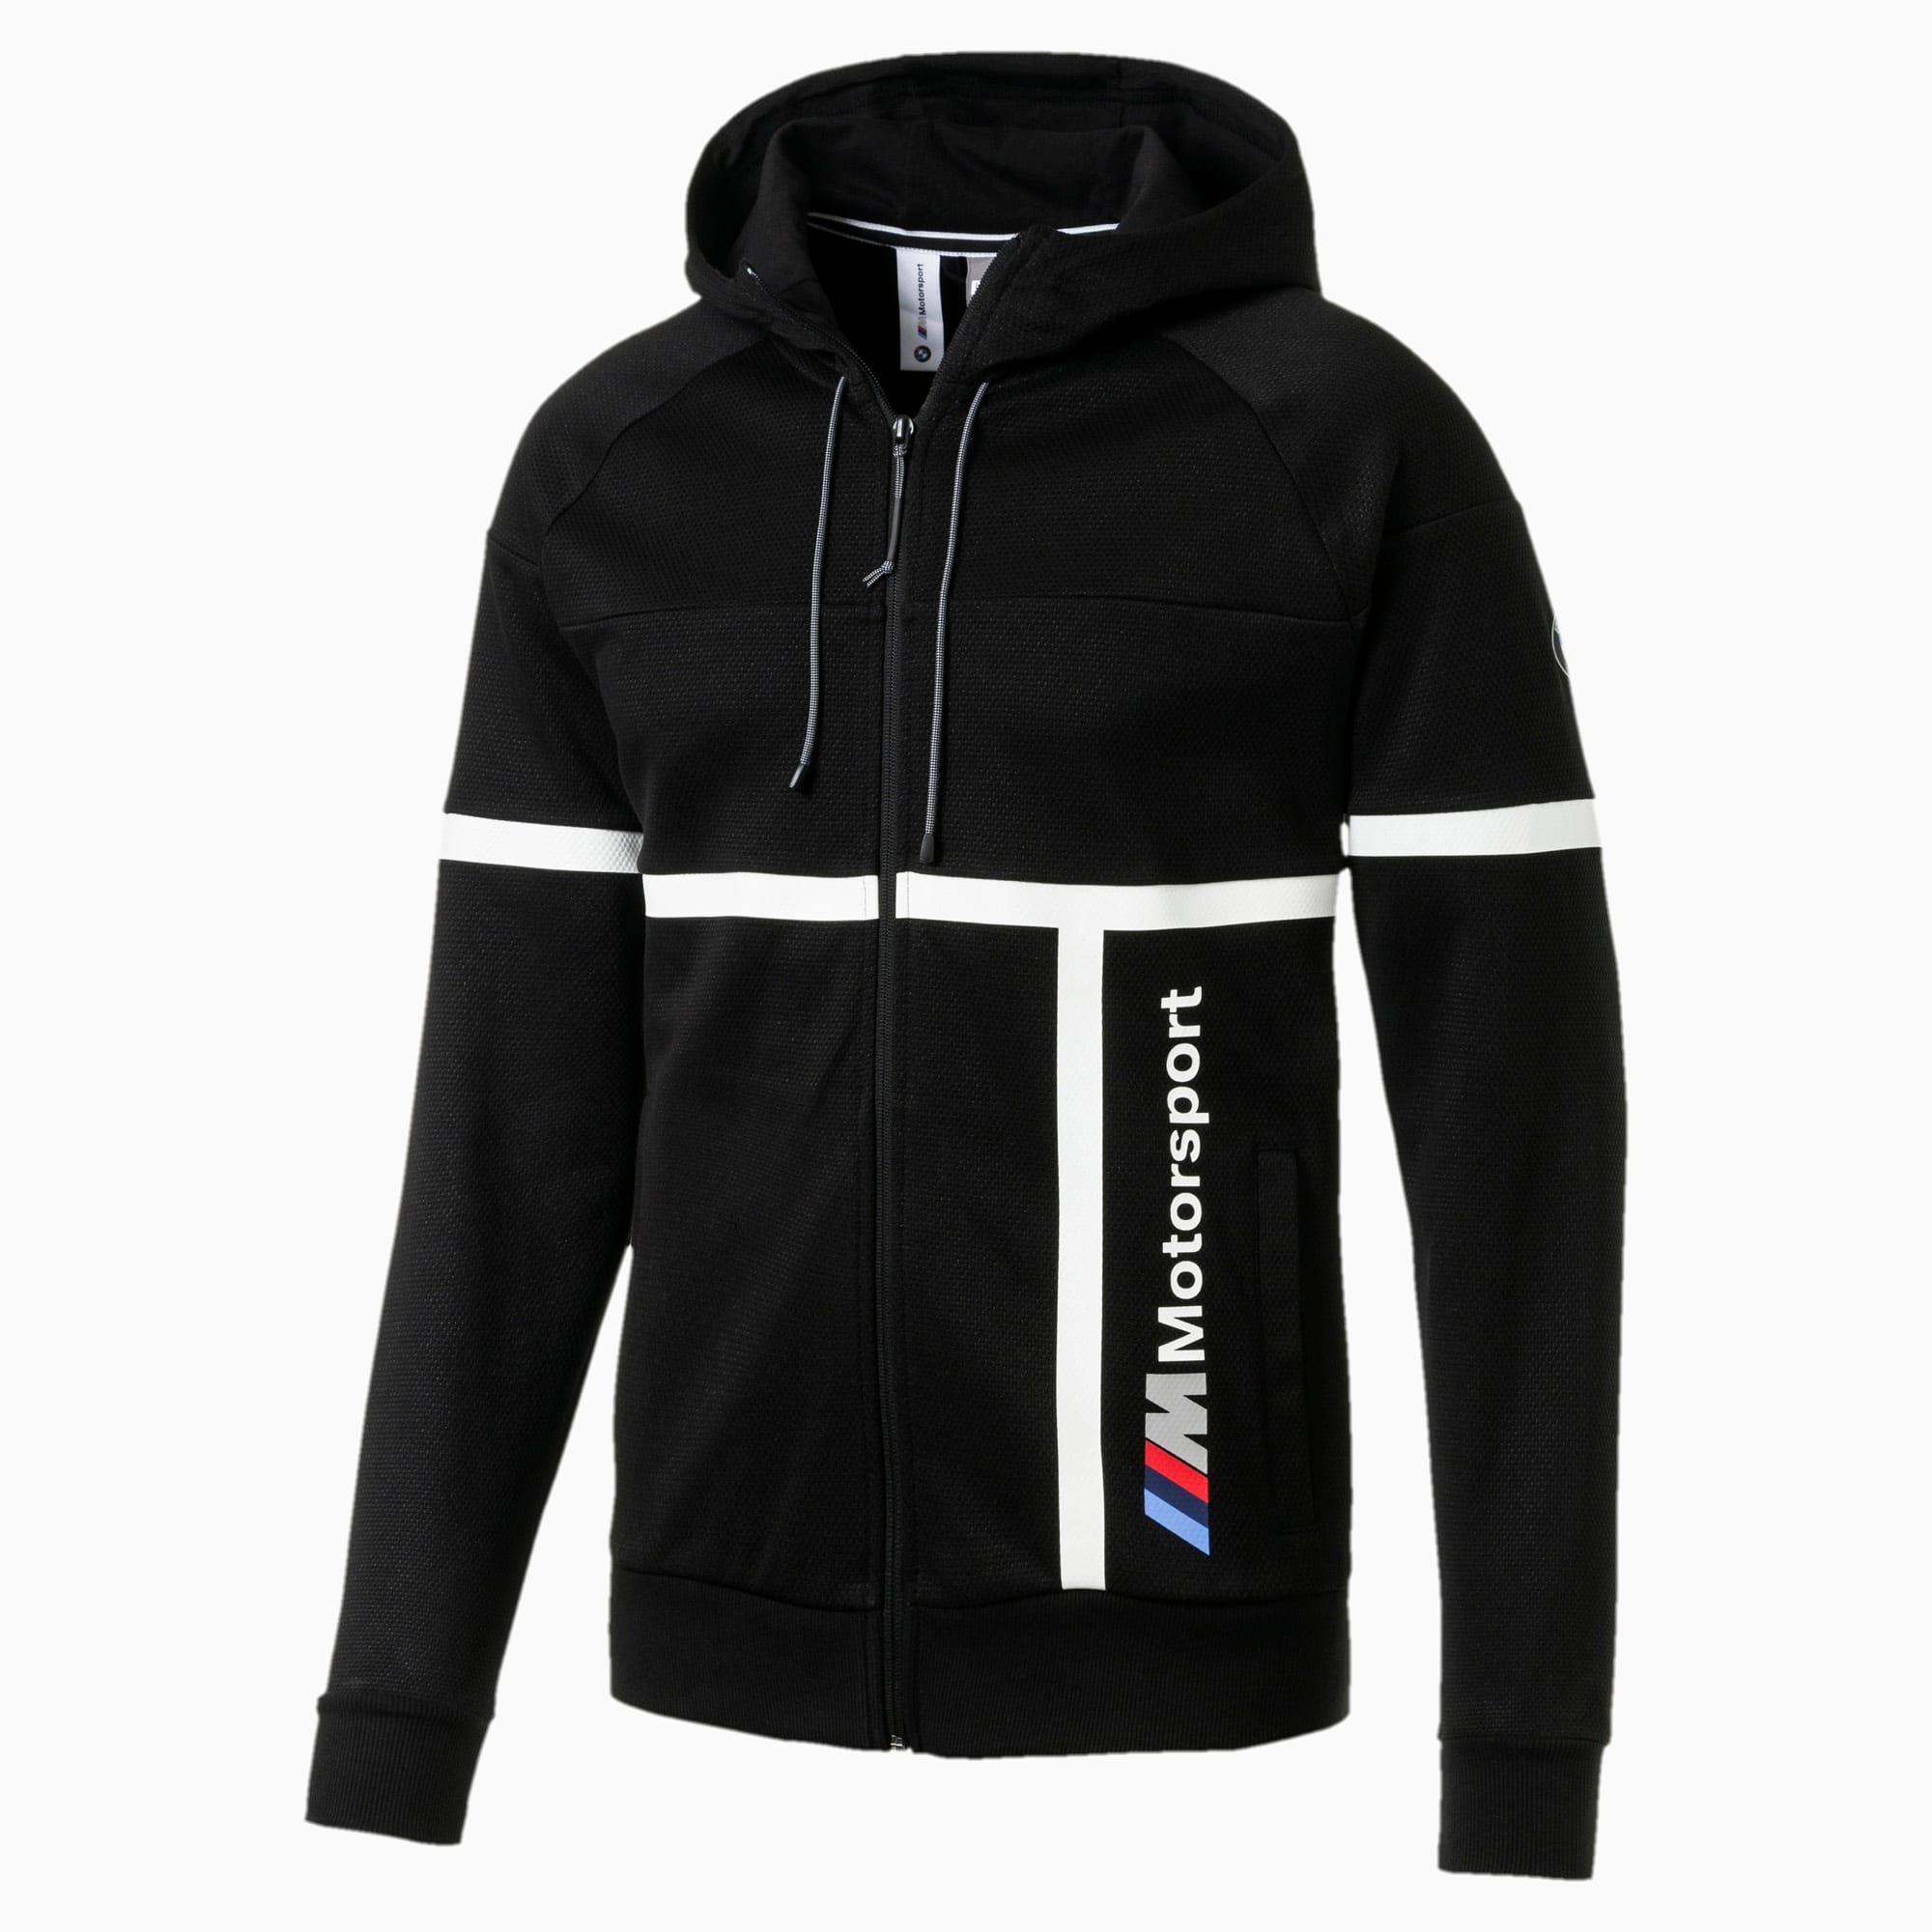 Bmw M Motorsport Hooded Men S Sweat Jacket Puma Black Puma Motorsport Puma Germany Jackets Mens Outfits Outerwear Jackets [ 2000 x 2000 Pixel ]